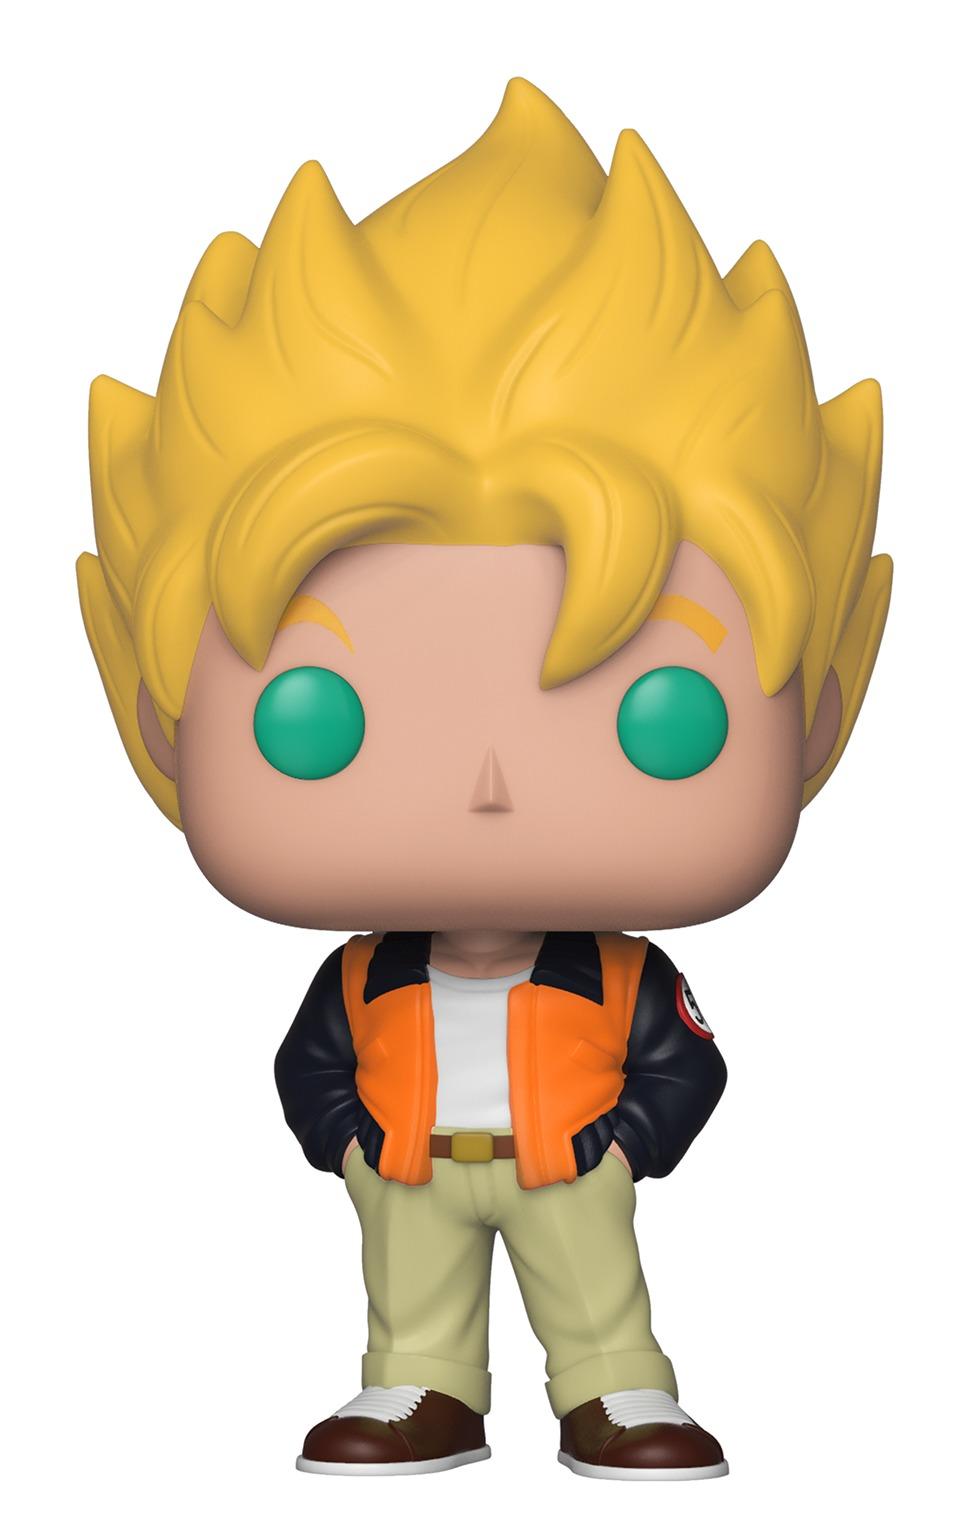 Dragon Ball Z – Goku (Casual) Pop! Vinyl Figure image